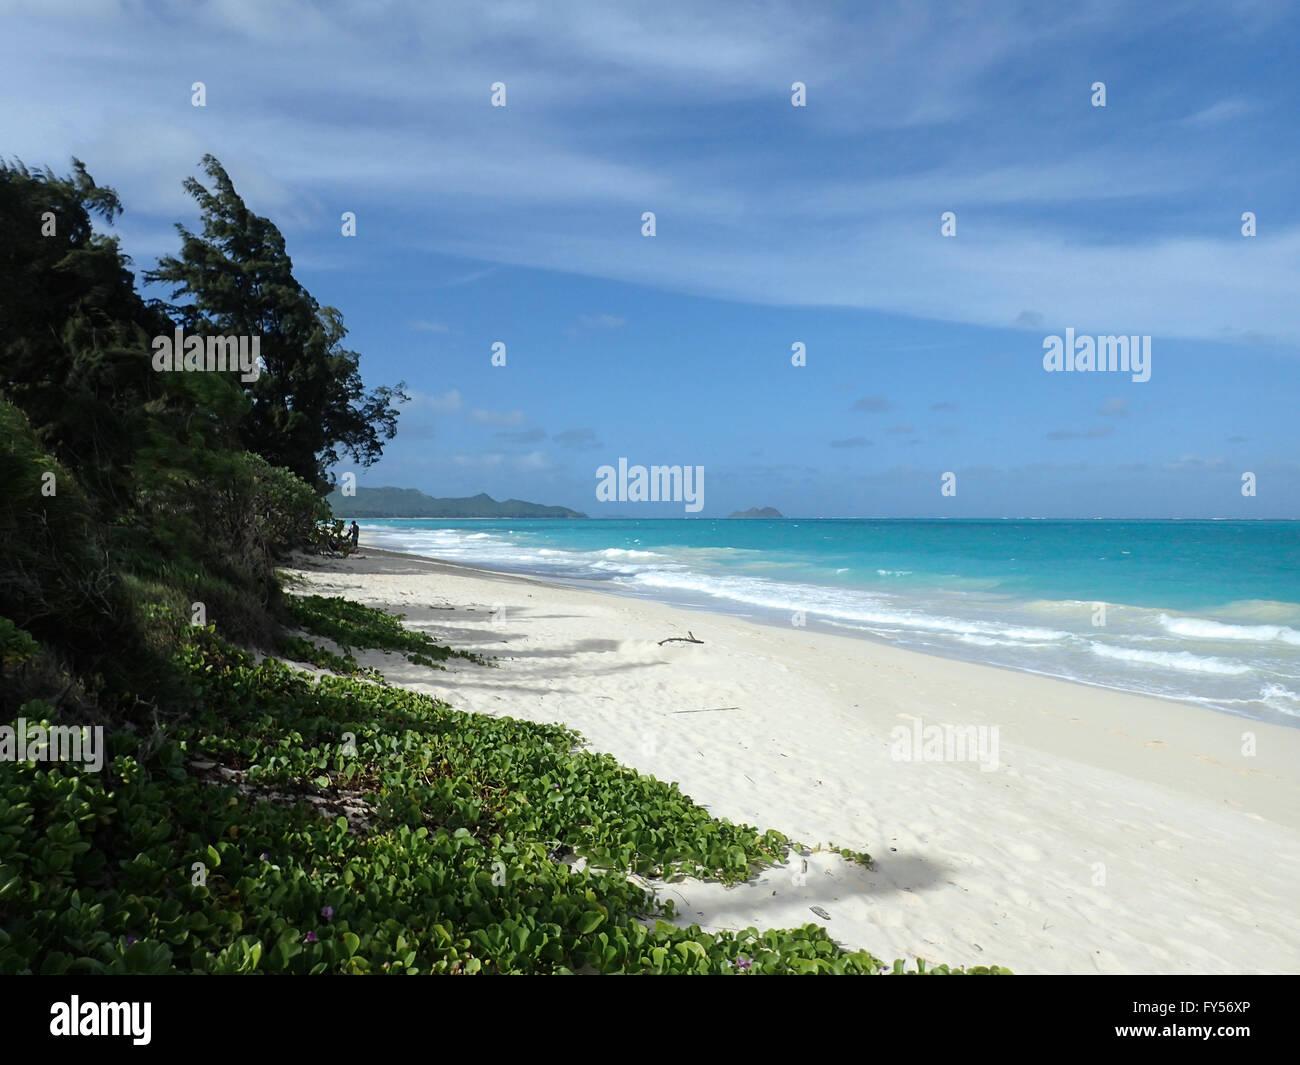 Gentle wave lap on white sand Waimanalo Beach looking towards Mokulua islands on a nice day Oahu, Hawaii. - Stock Image